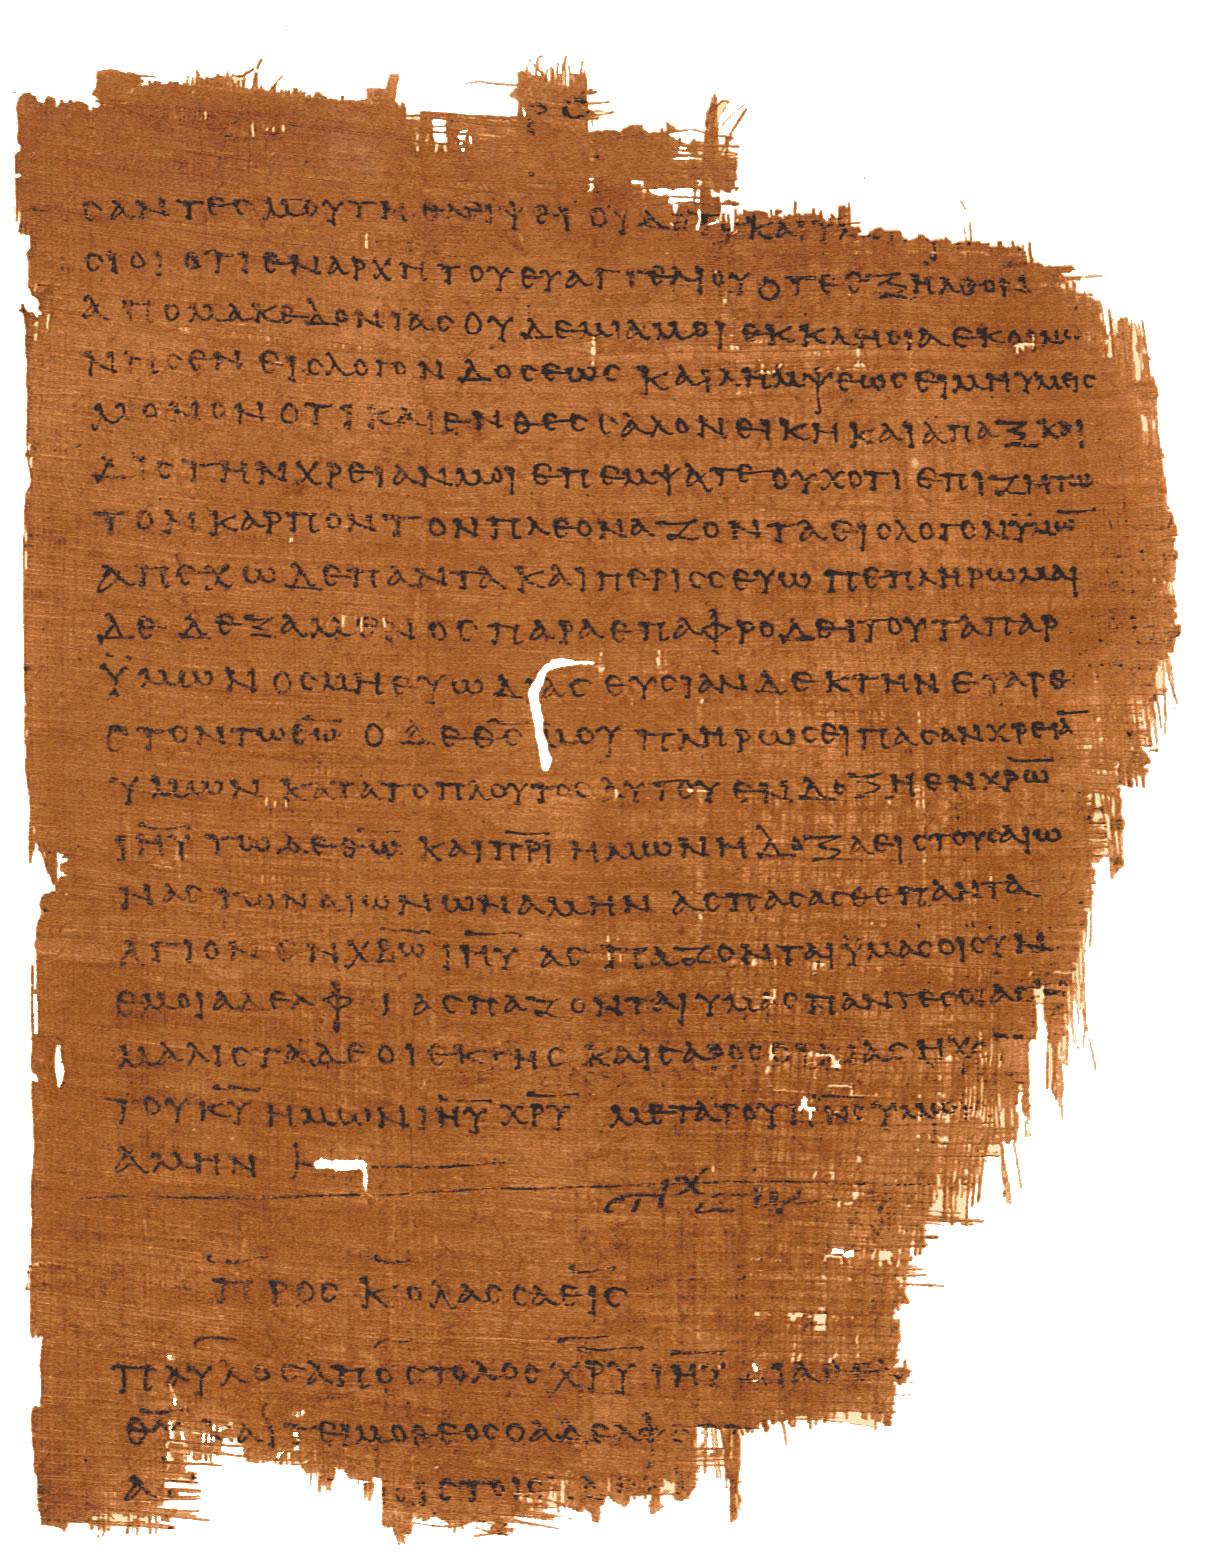 https://earlybible.com/manuscripts/p46-Col.html